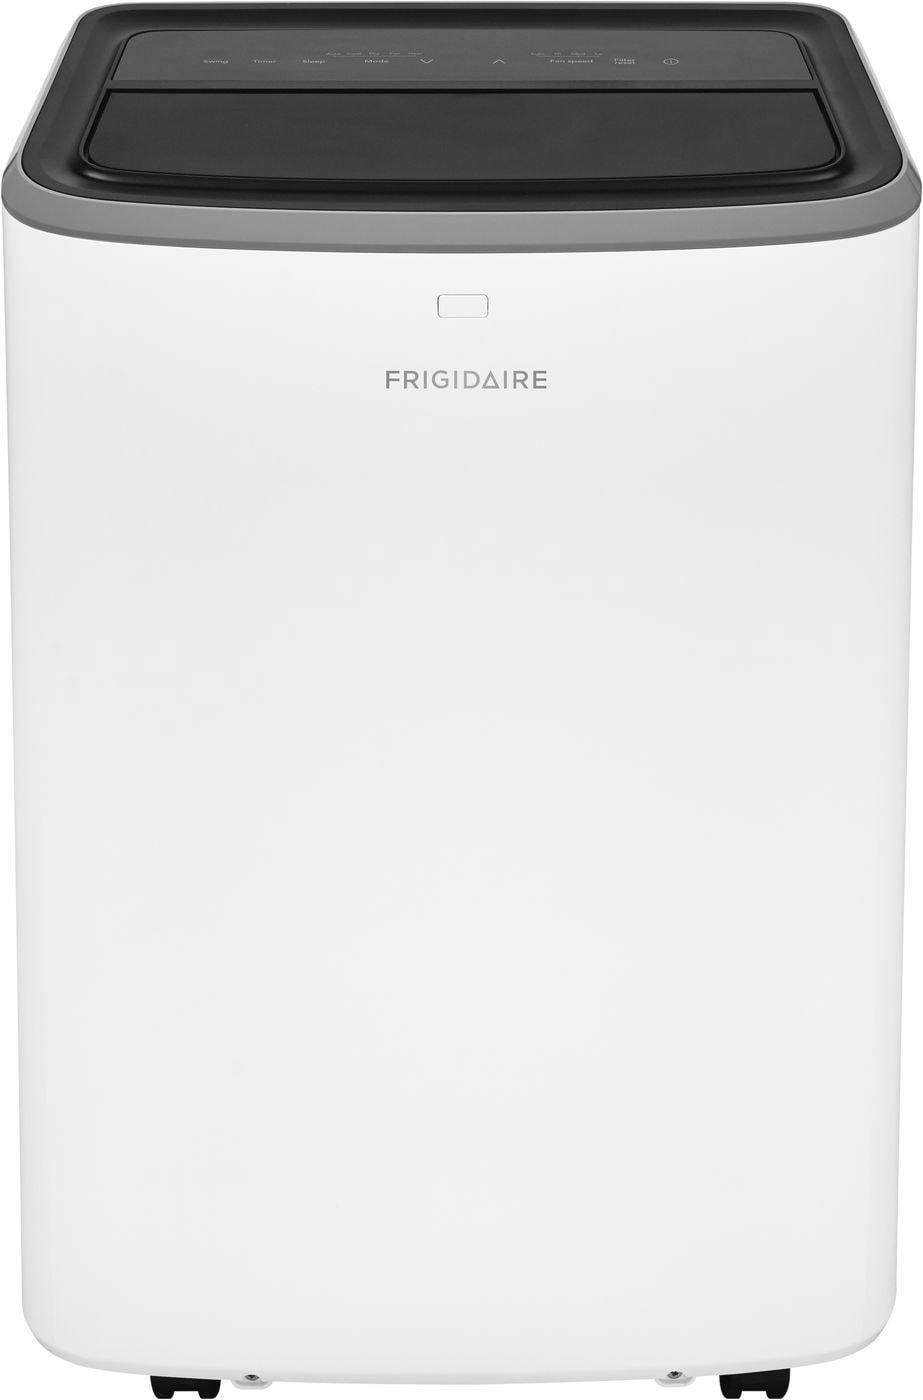 Frigidaire 13,000 BTU Portable Room Air Conditioner with Heat Pump